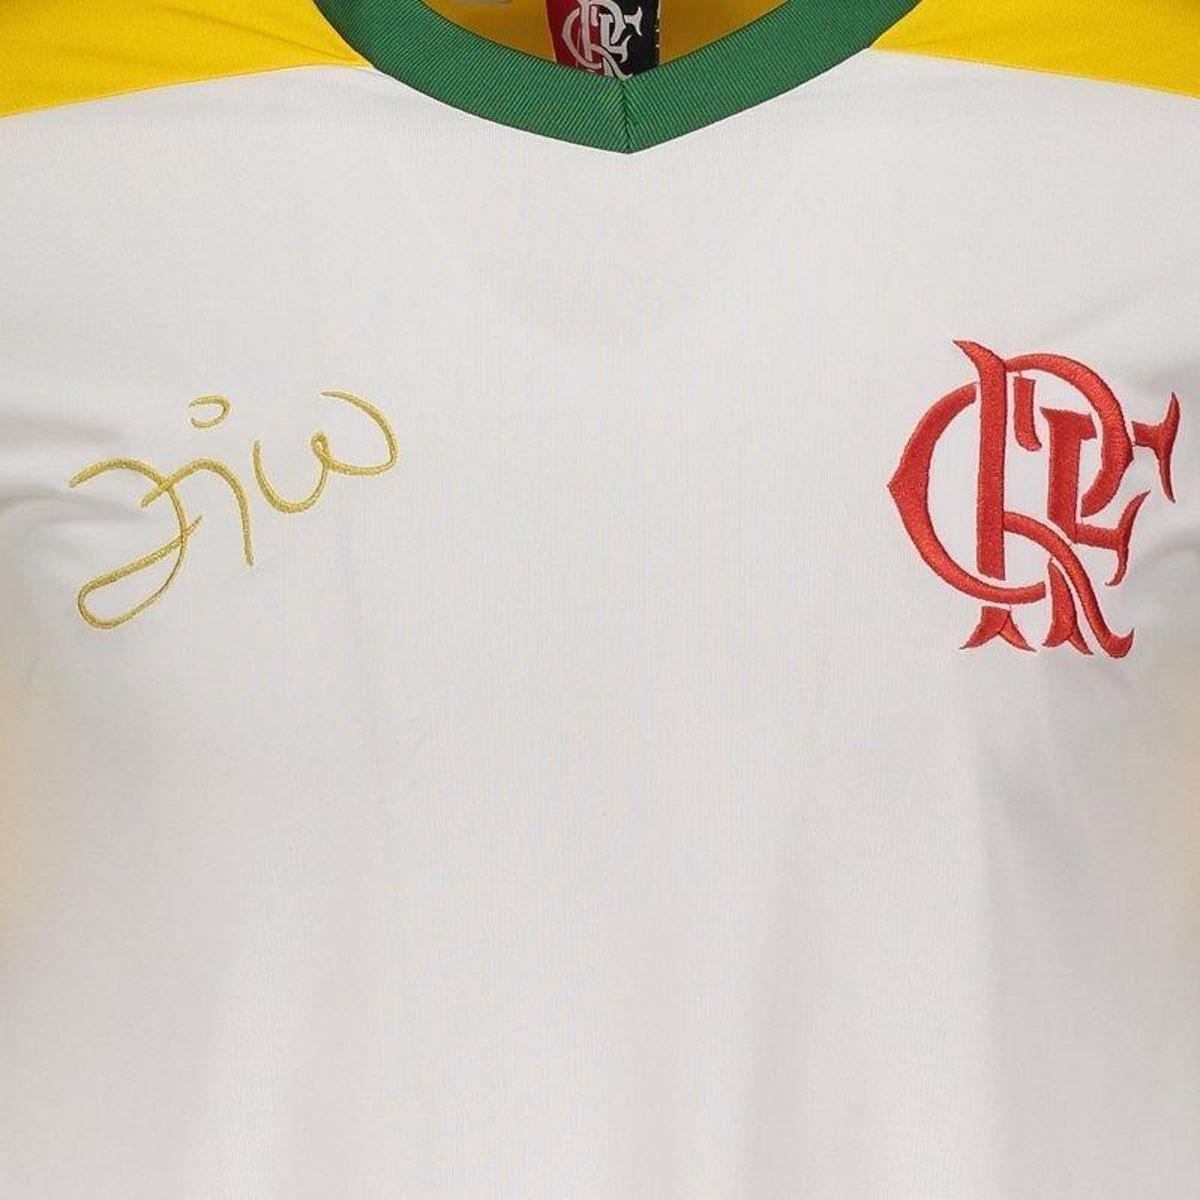 Camisa Brasil Flamengo Zico Retrô Masculina - Branco - Compre Agora ... 8eb04880dcf00